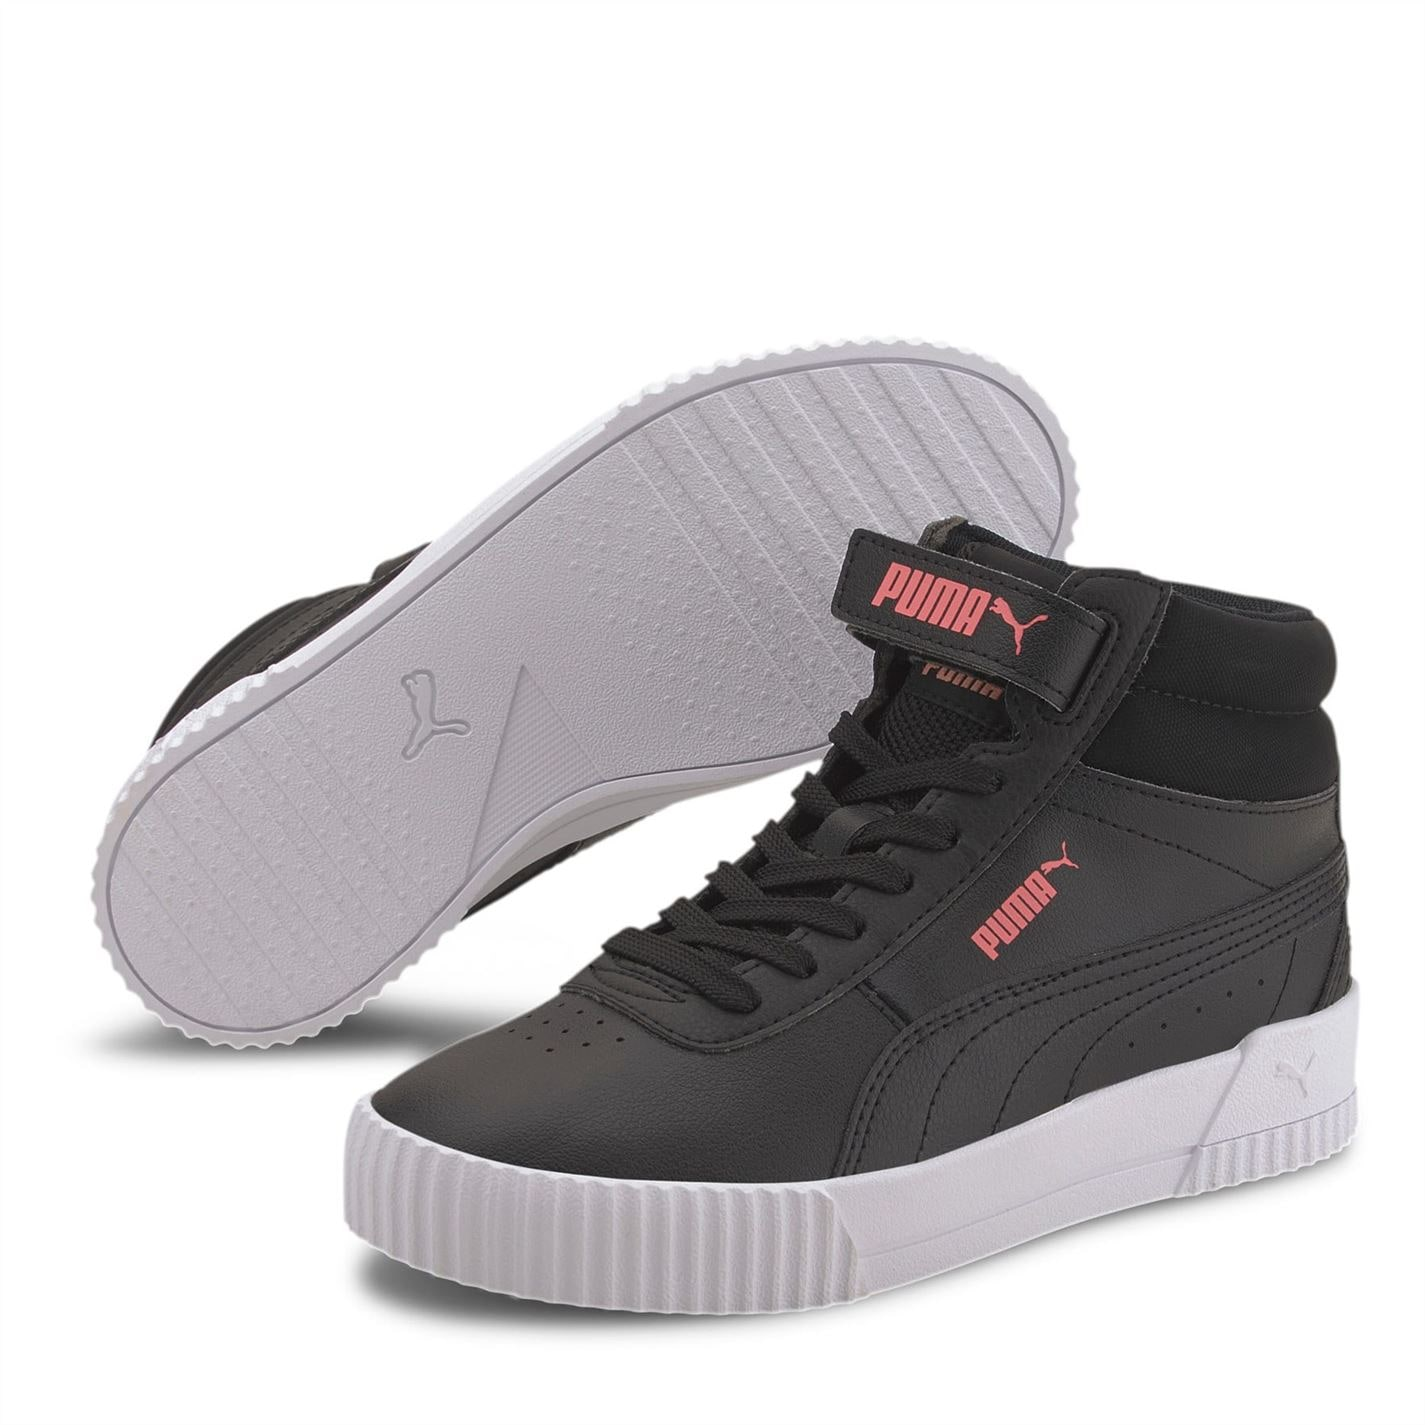 Adidasi sport Puma Carina Mid pentru fetite negru